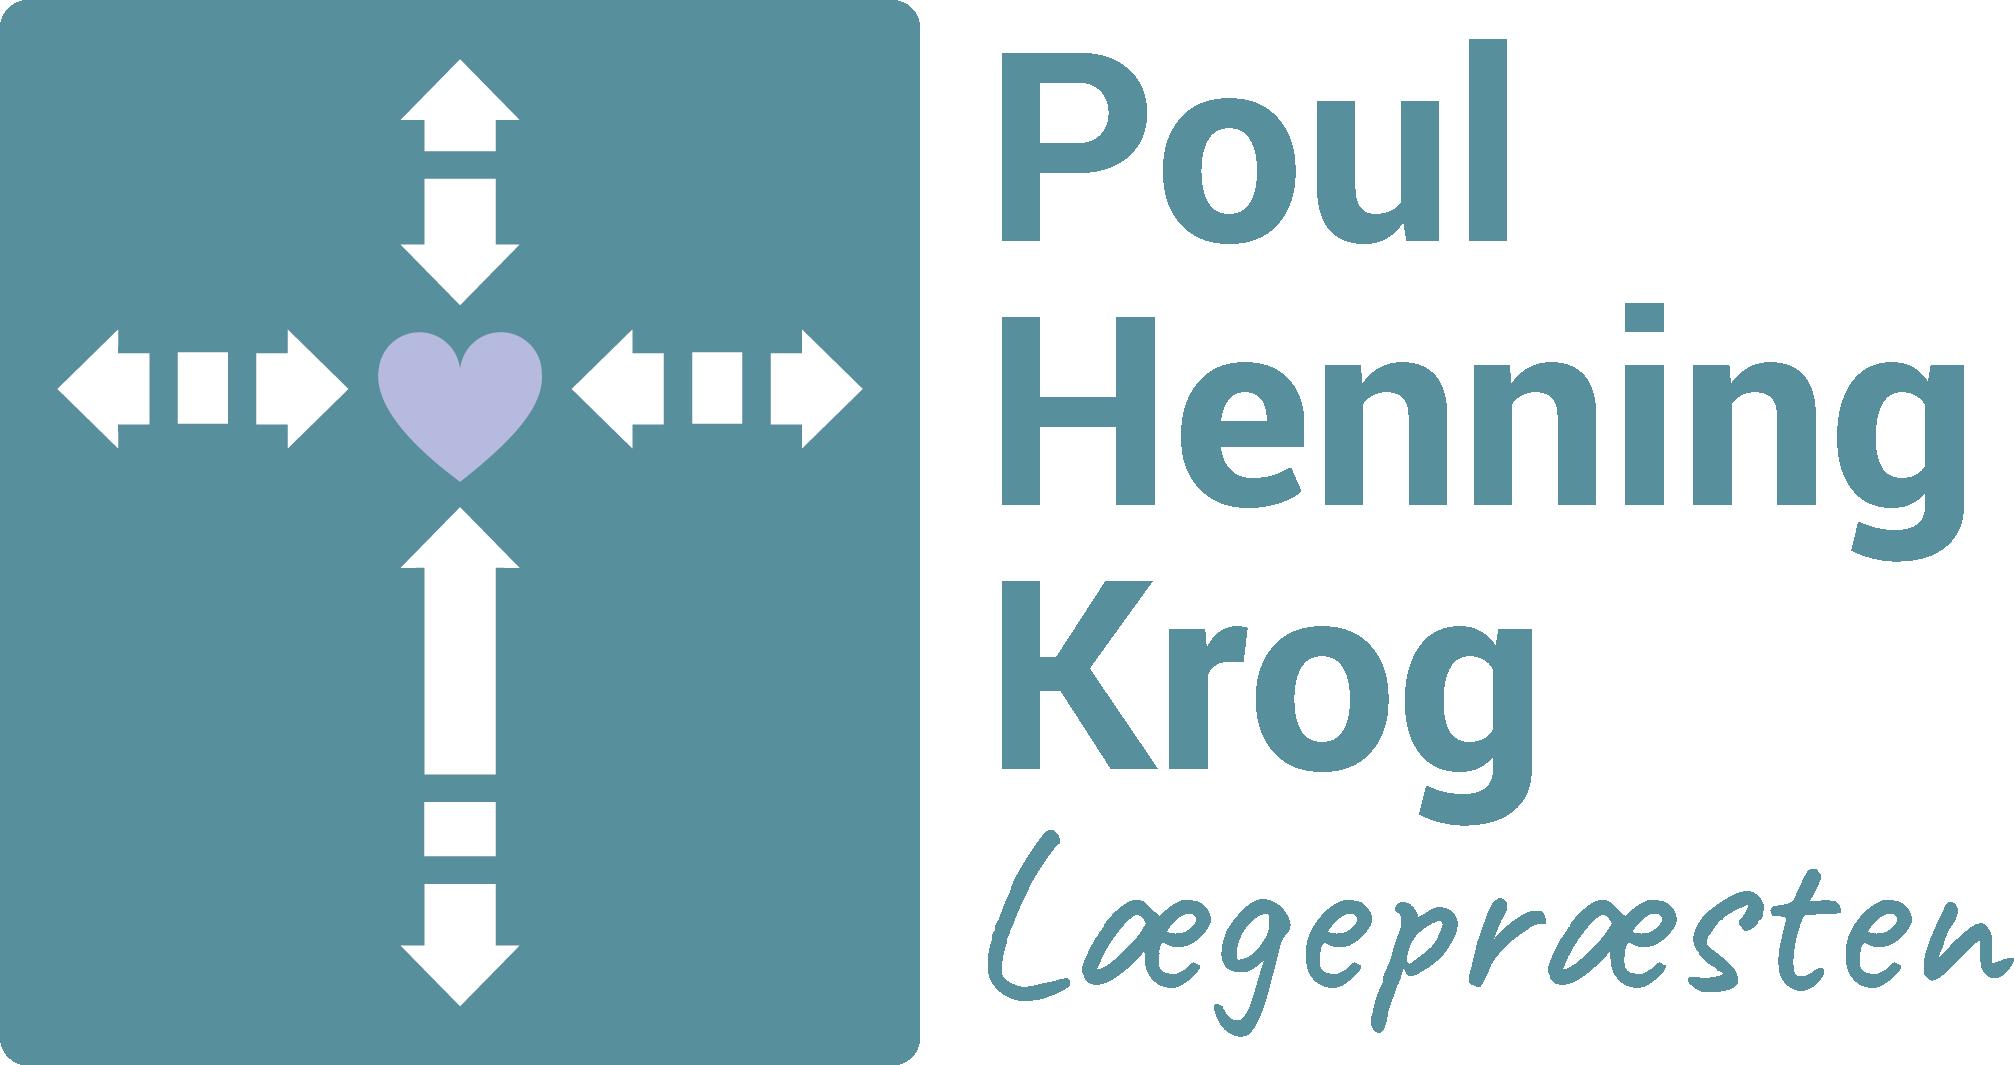 Poul Henning Krog